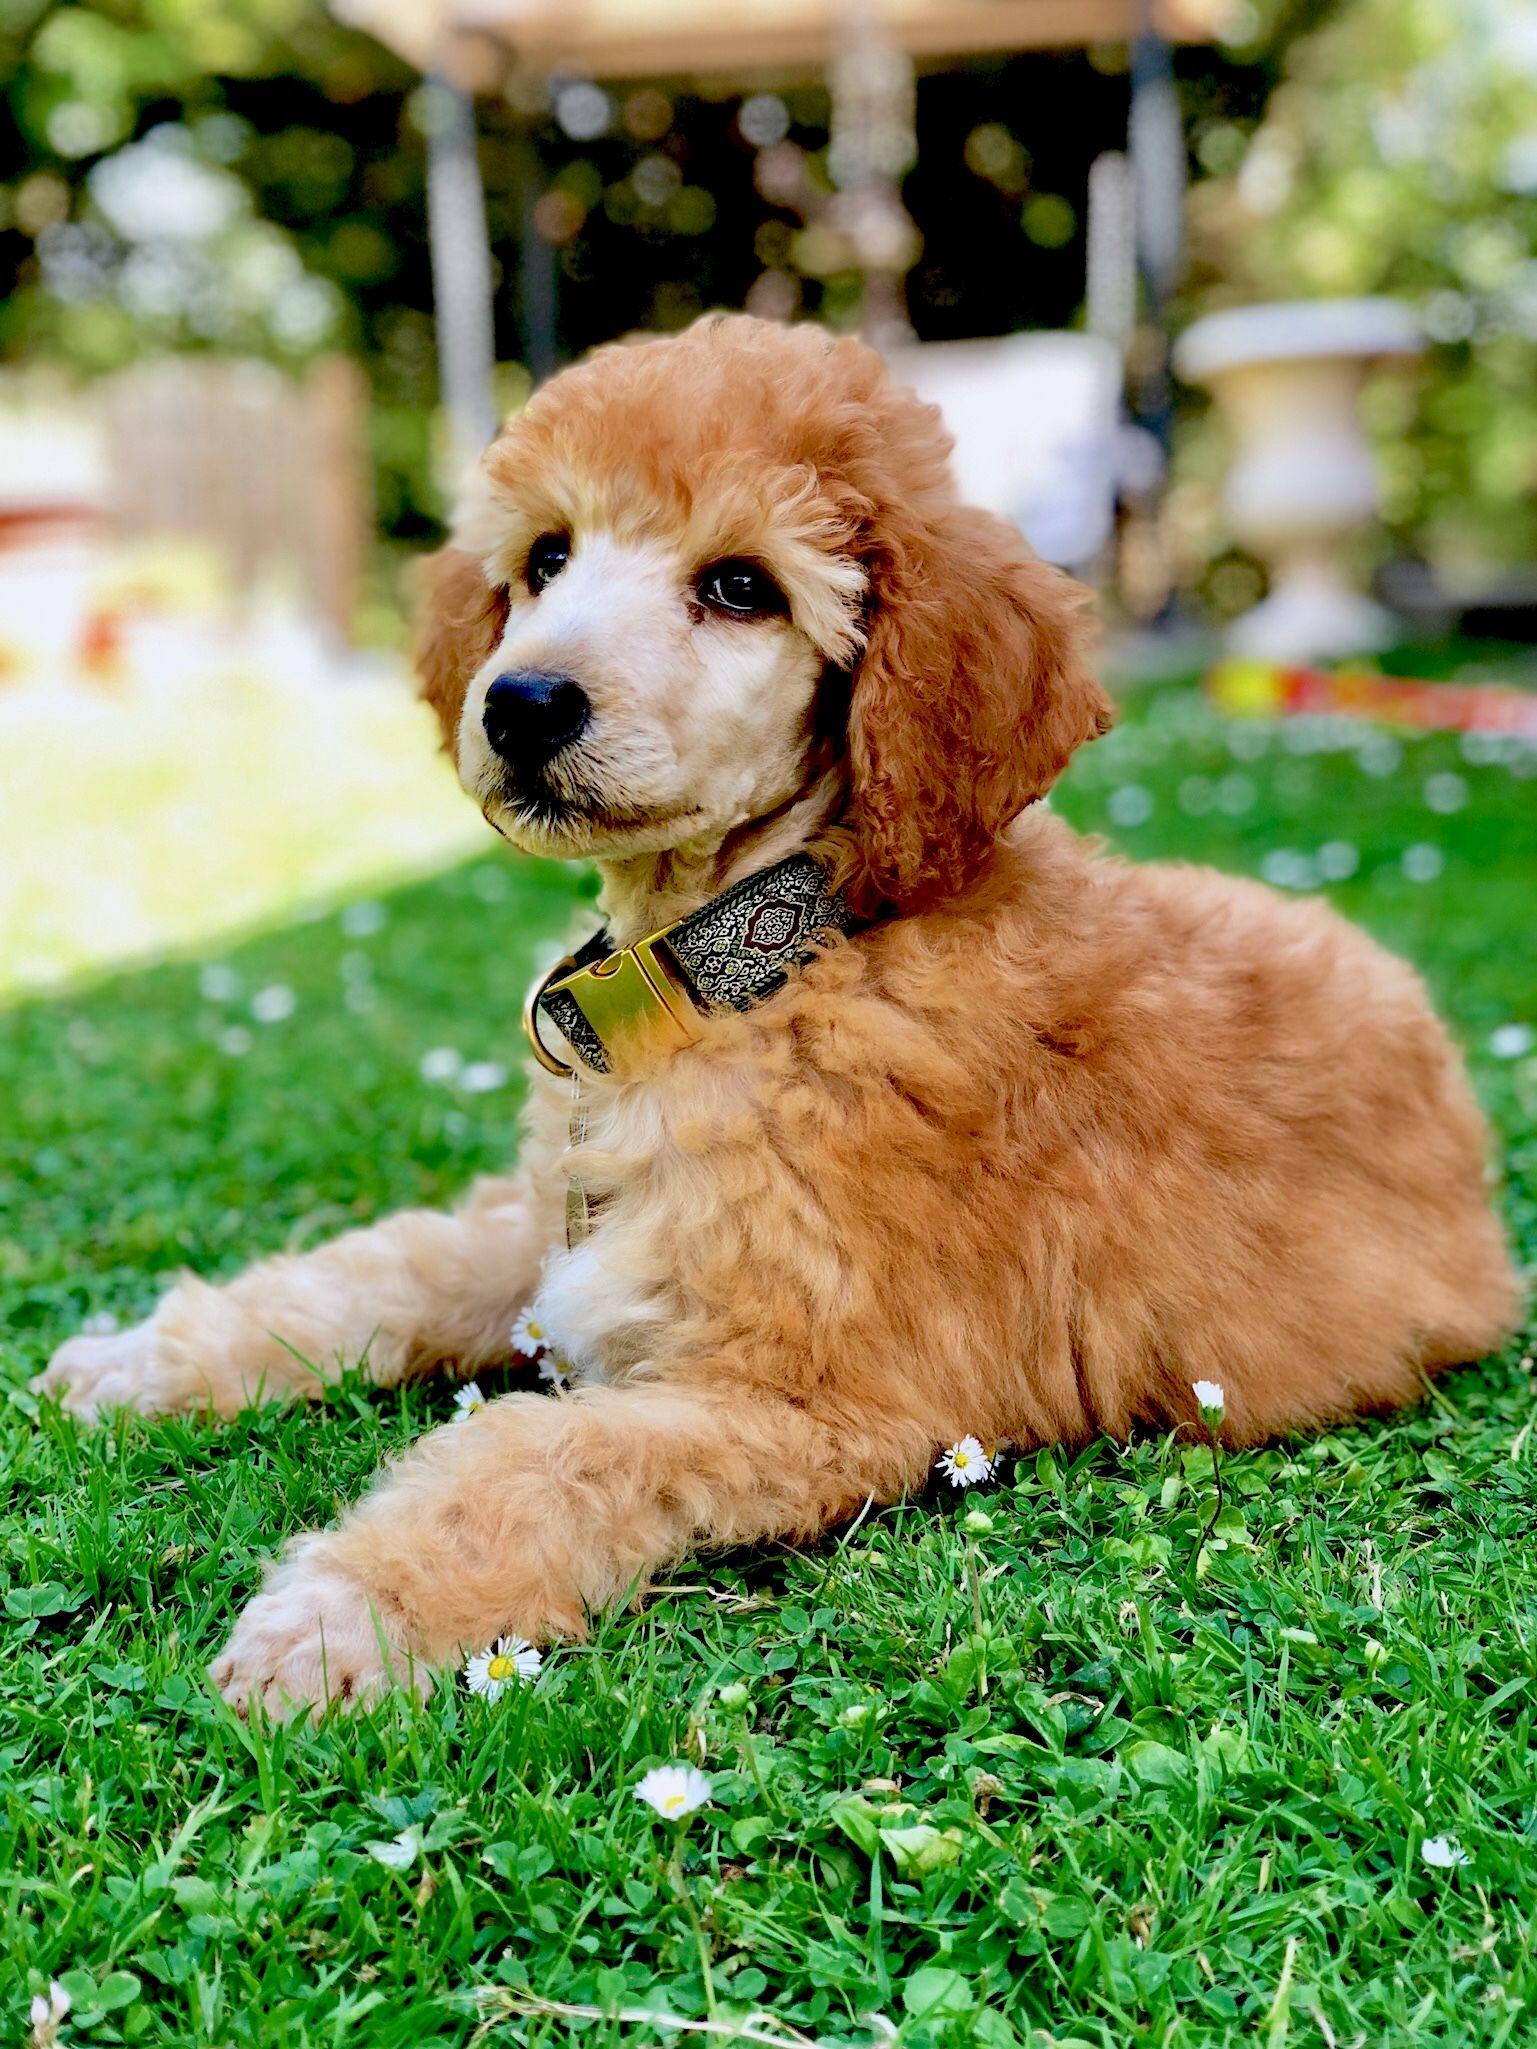 9 Week Old Apricot Standard Poodle Puppy Argentcymru Orsino